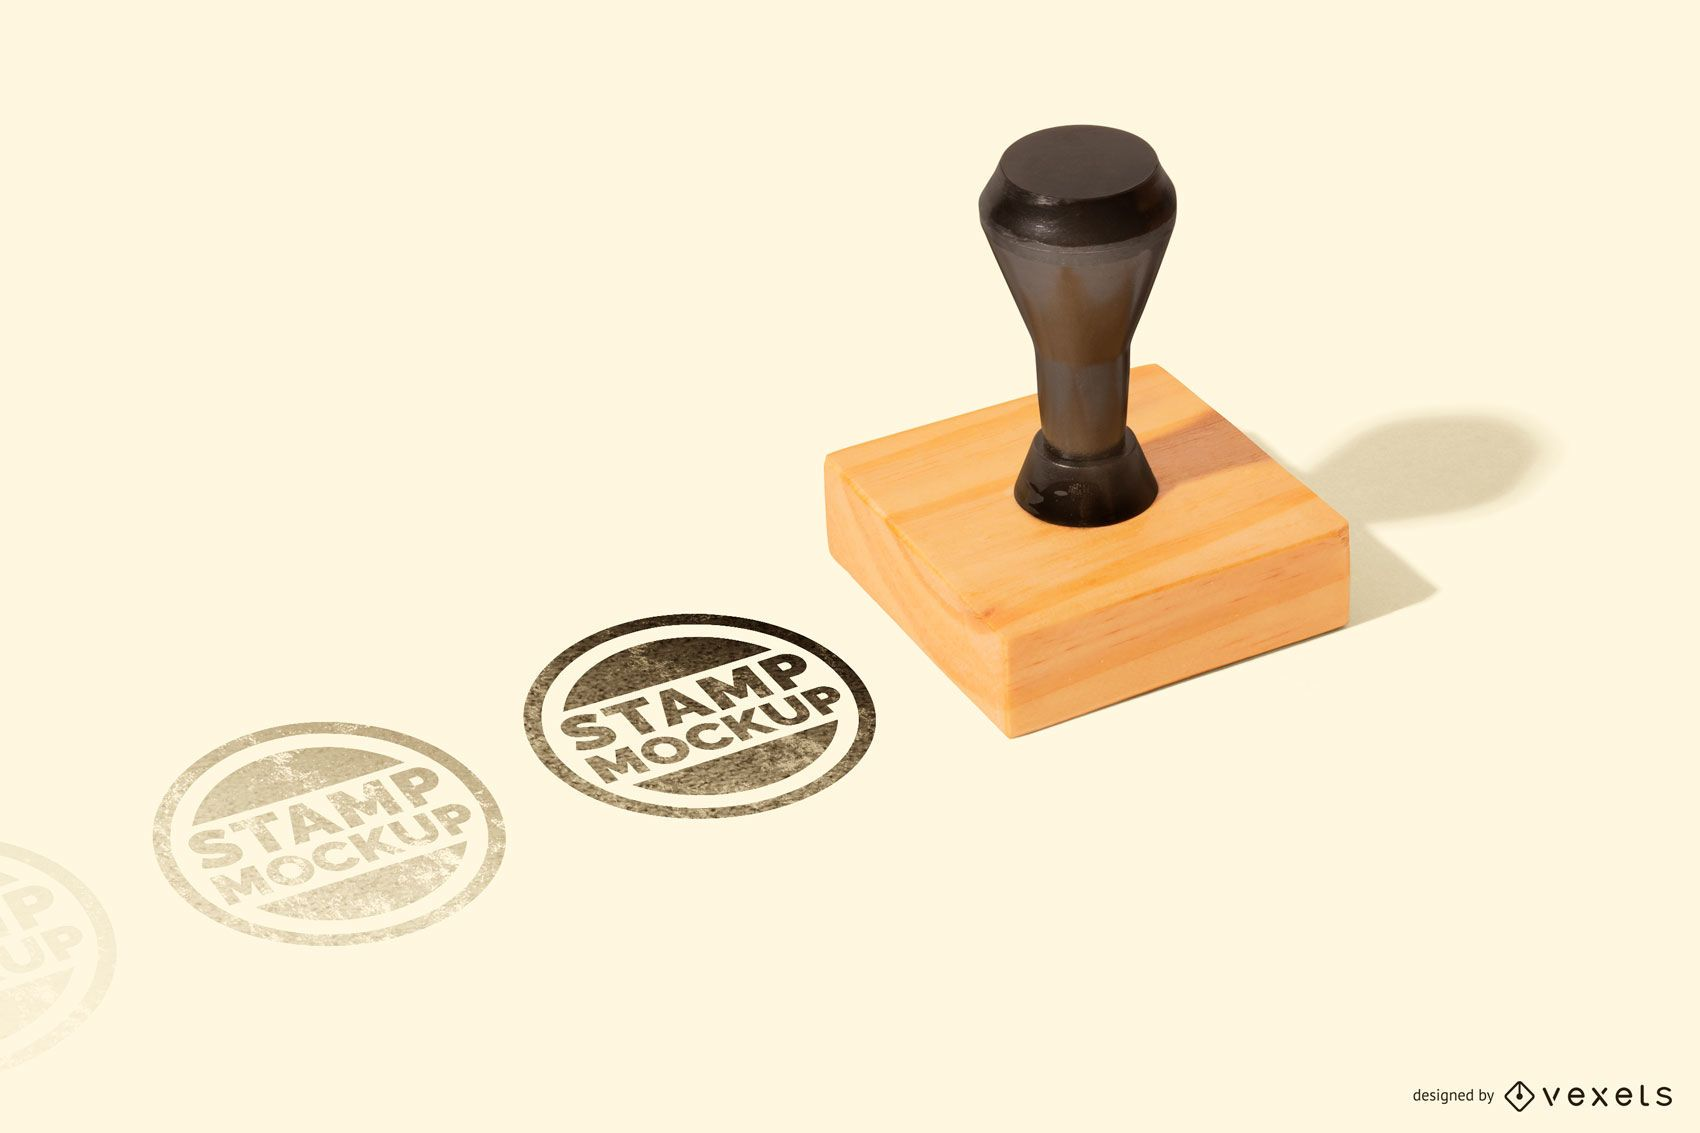 Square Rubber Stamp Mockup